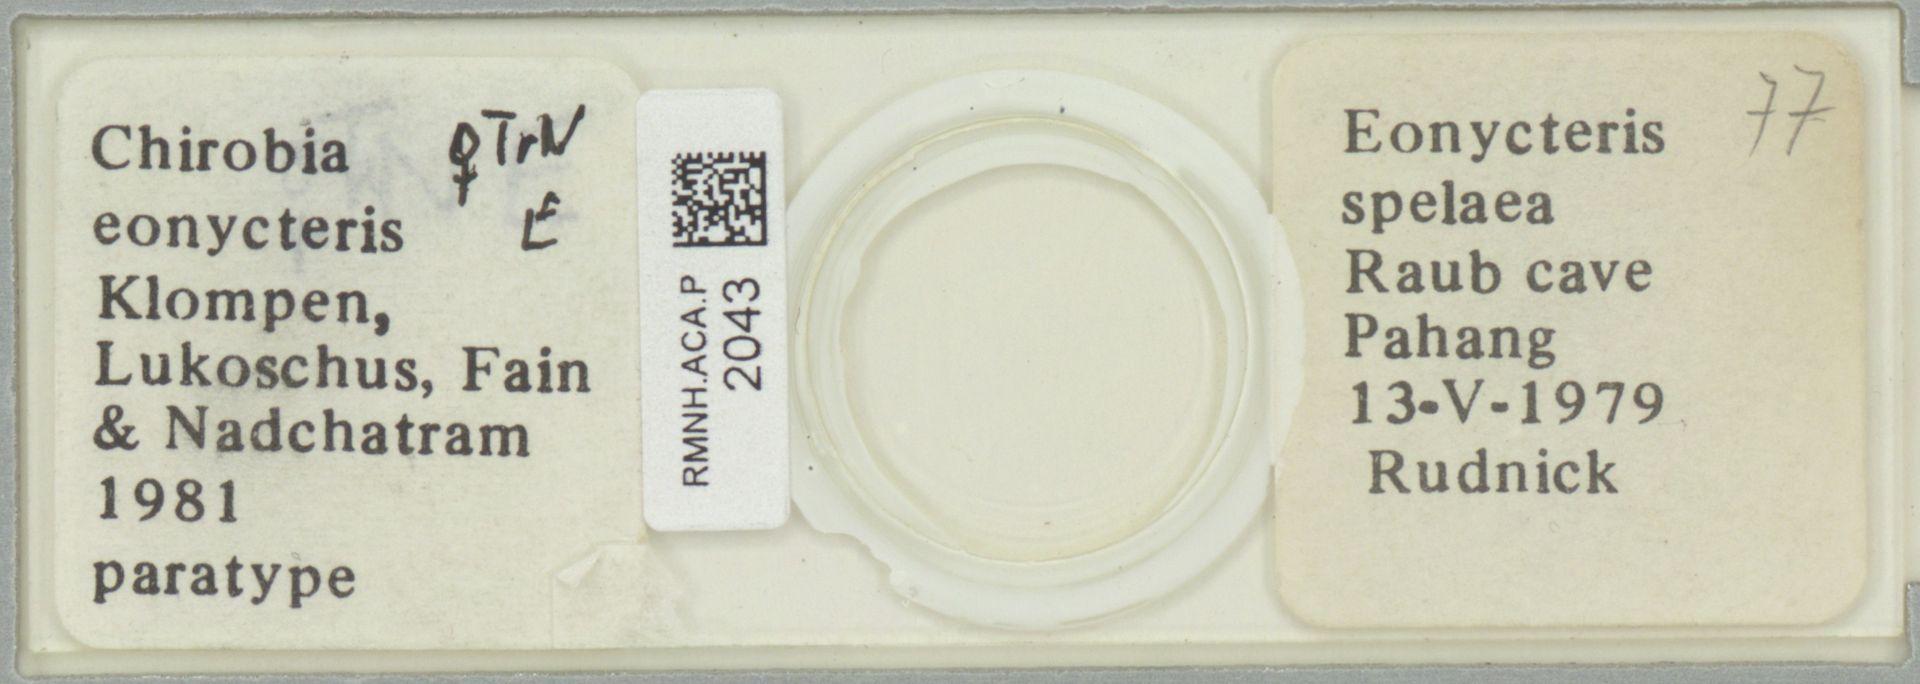 RMNH.ACA.P.2043 | Chirobia eonycteris Klompen, Lukoschus & Nadchatram, 1981